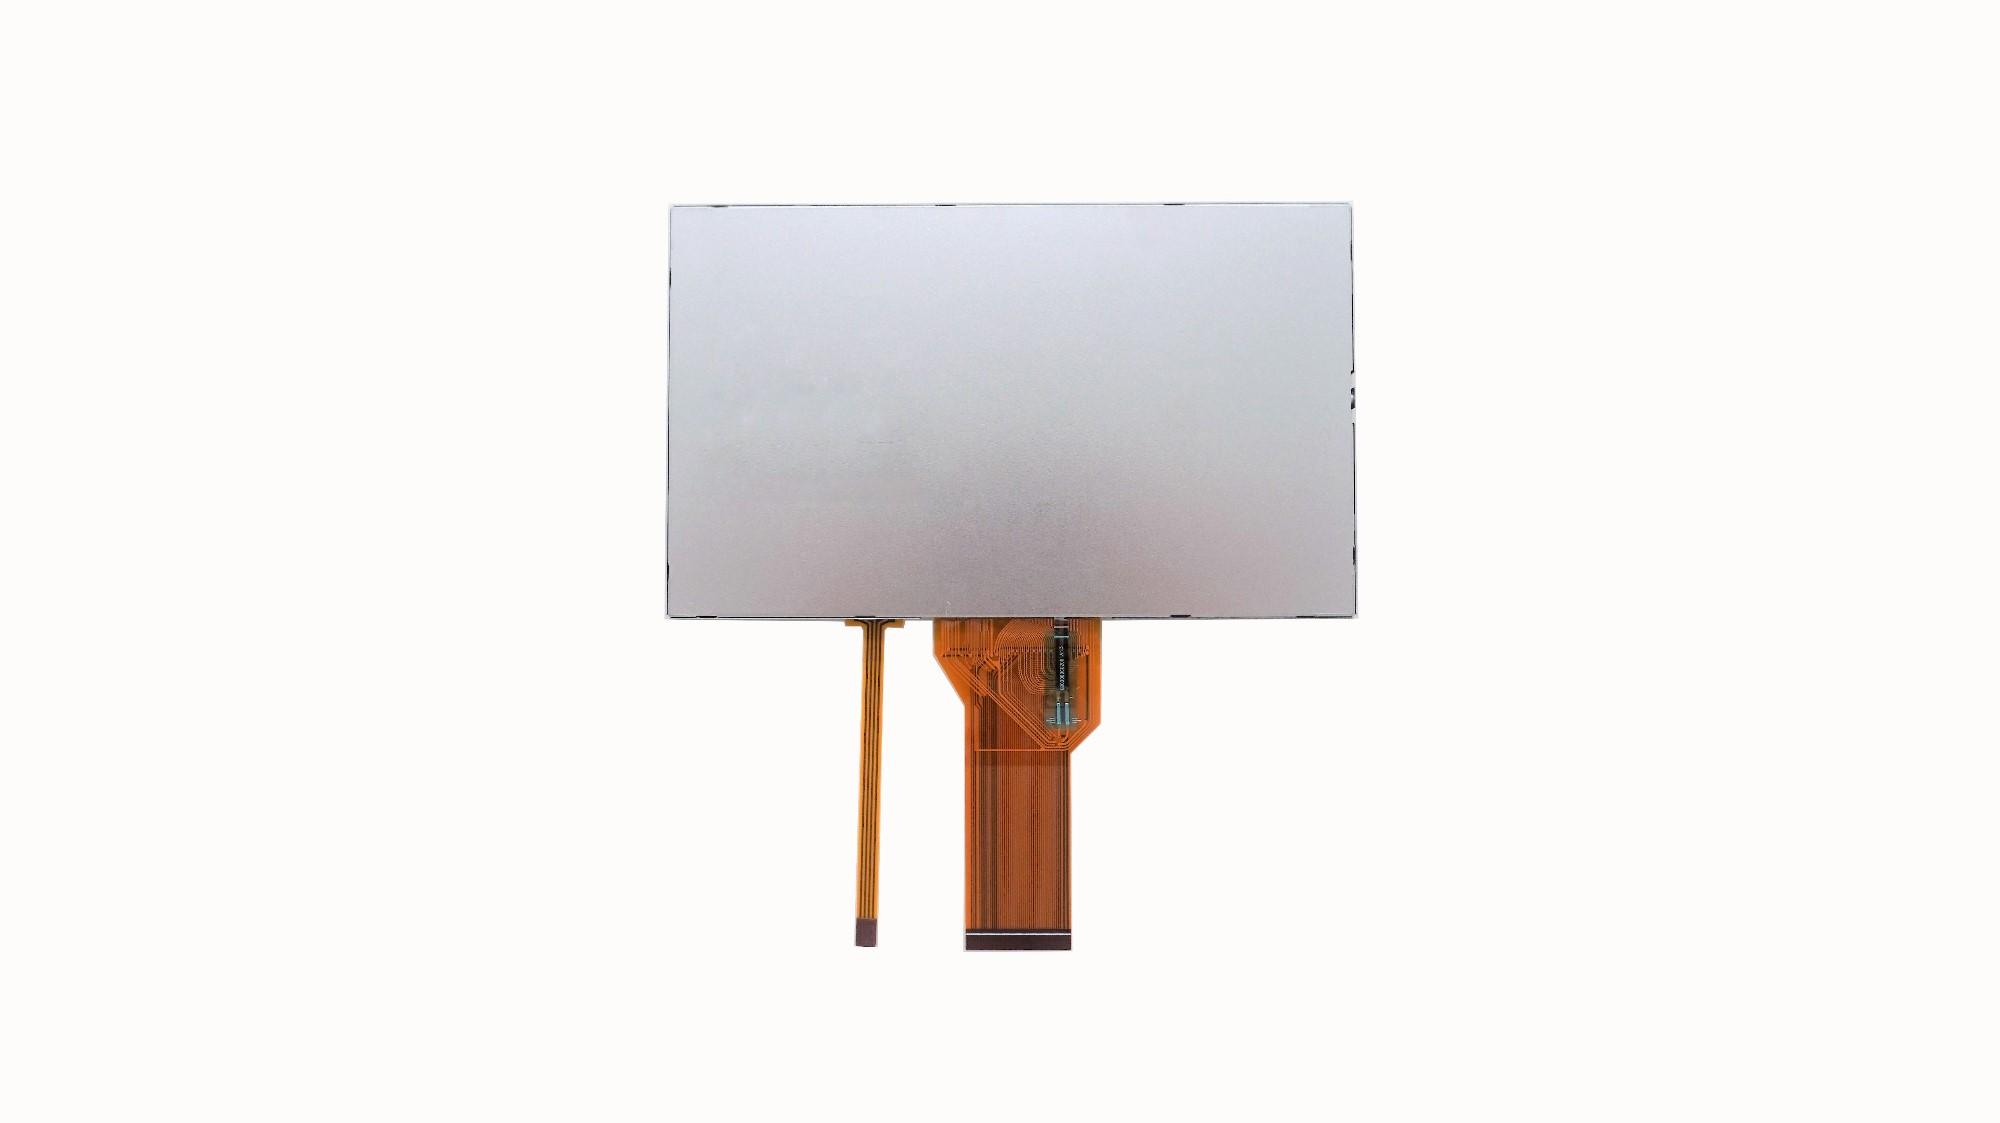 Custom China 7.0 Inch TFT LCD Module Mcu Interface 40 Pins With Touch Screen, 7.0 Inch TFT LCD Module Mcu Interface 40 Pins With Touch Screen Factory, 7.0 Inch TFT LCD Module Mcu Interface 40 Pins With Touch Screen OEM